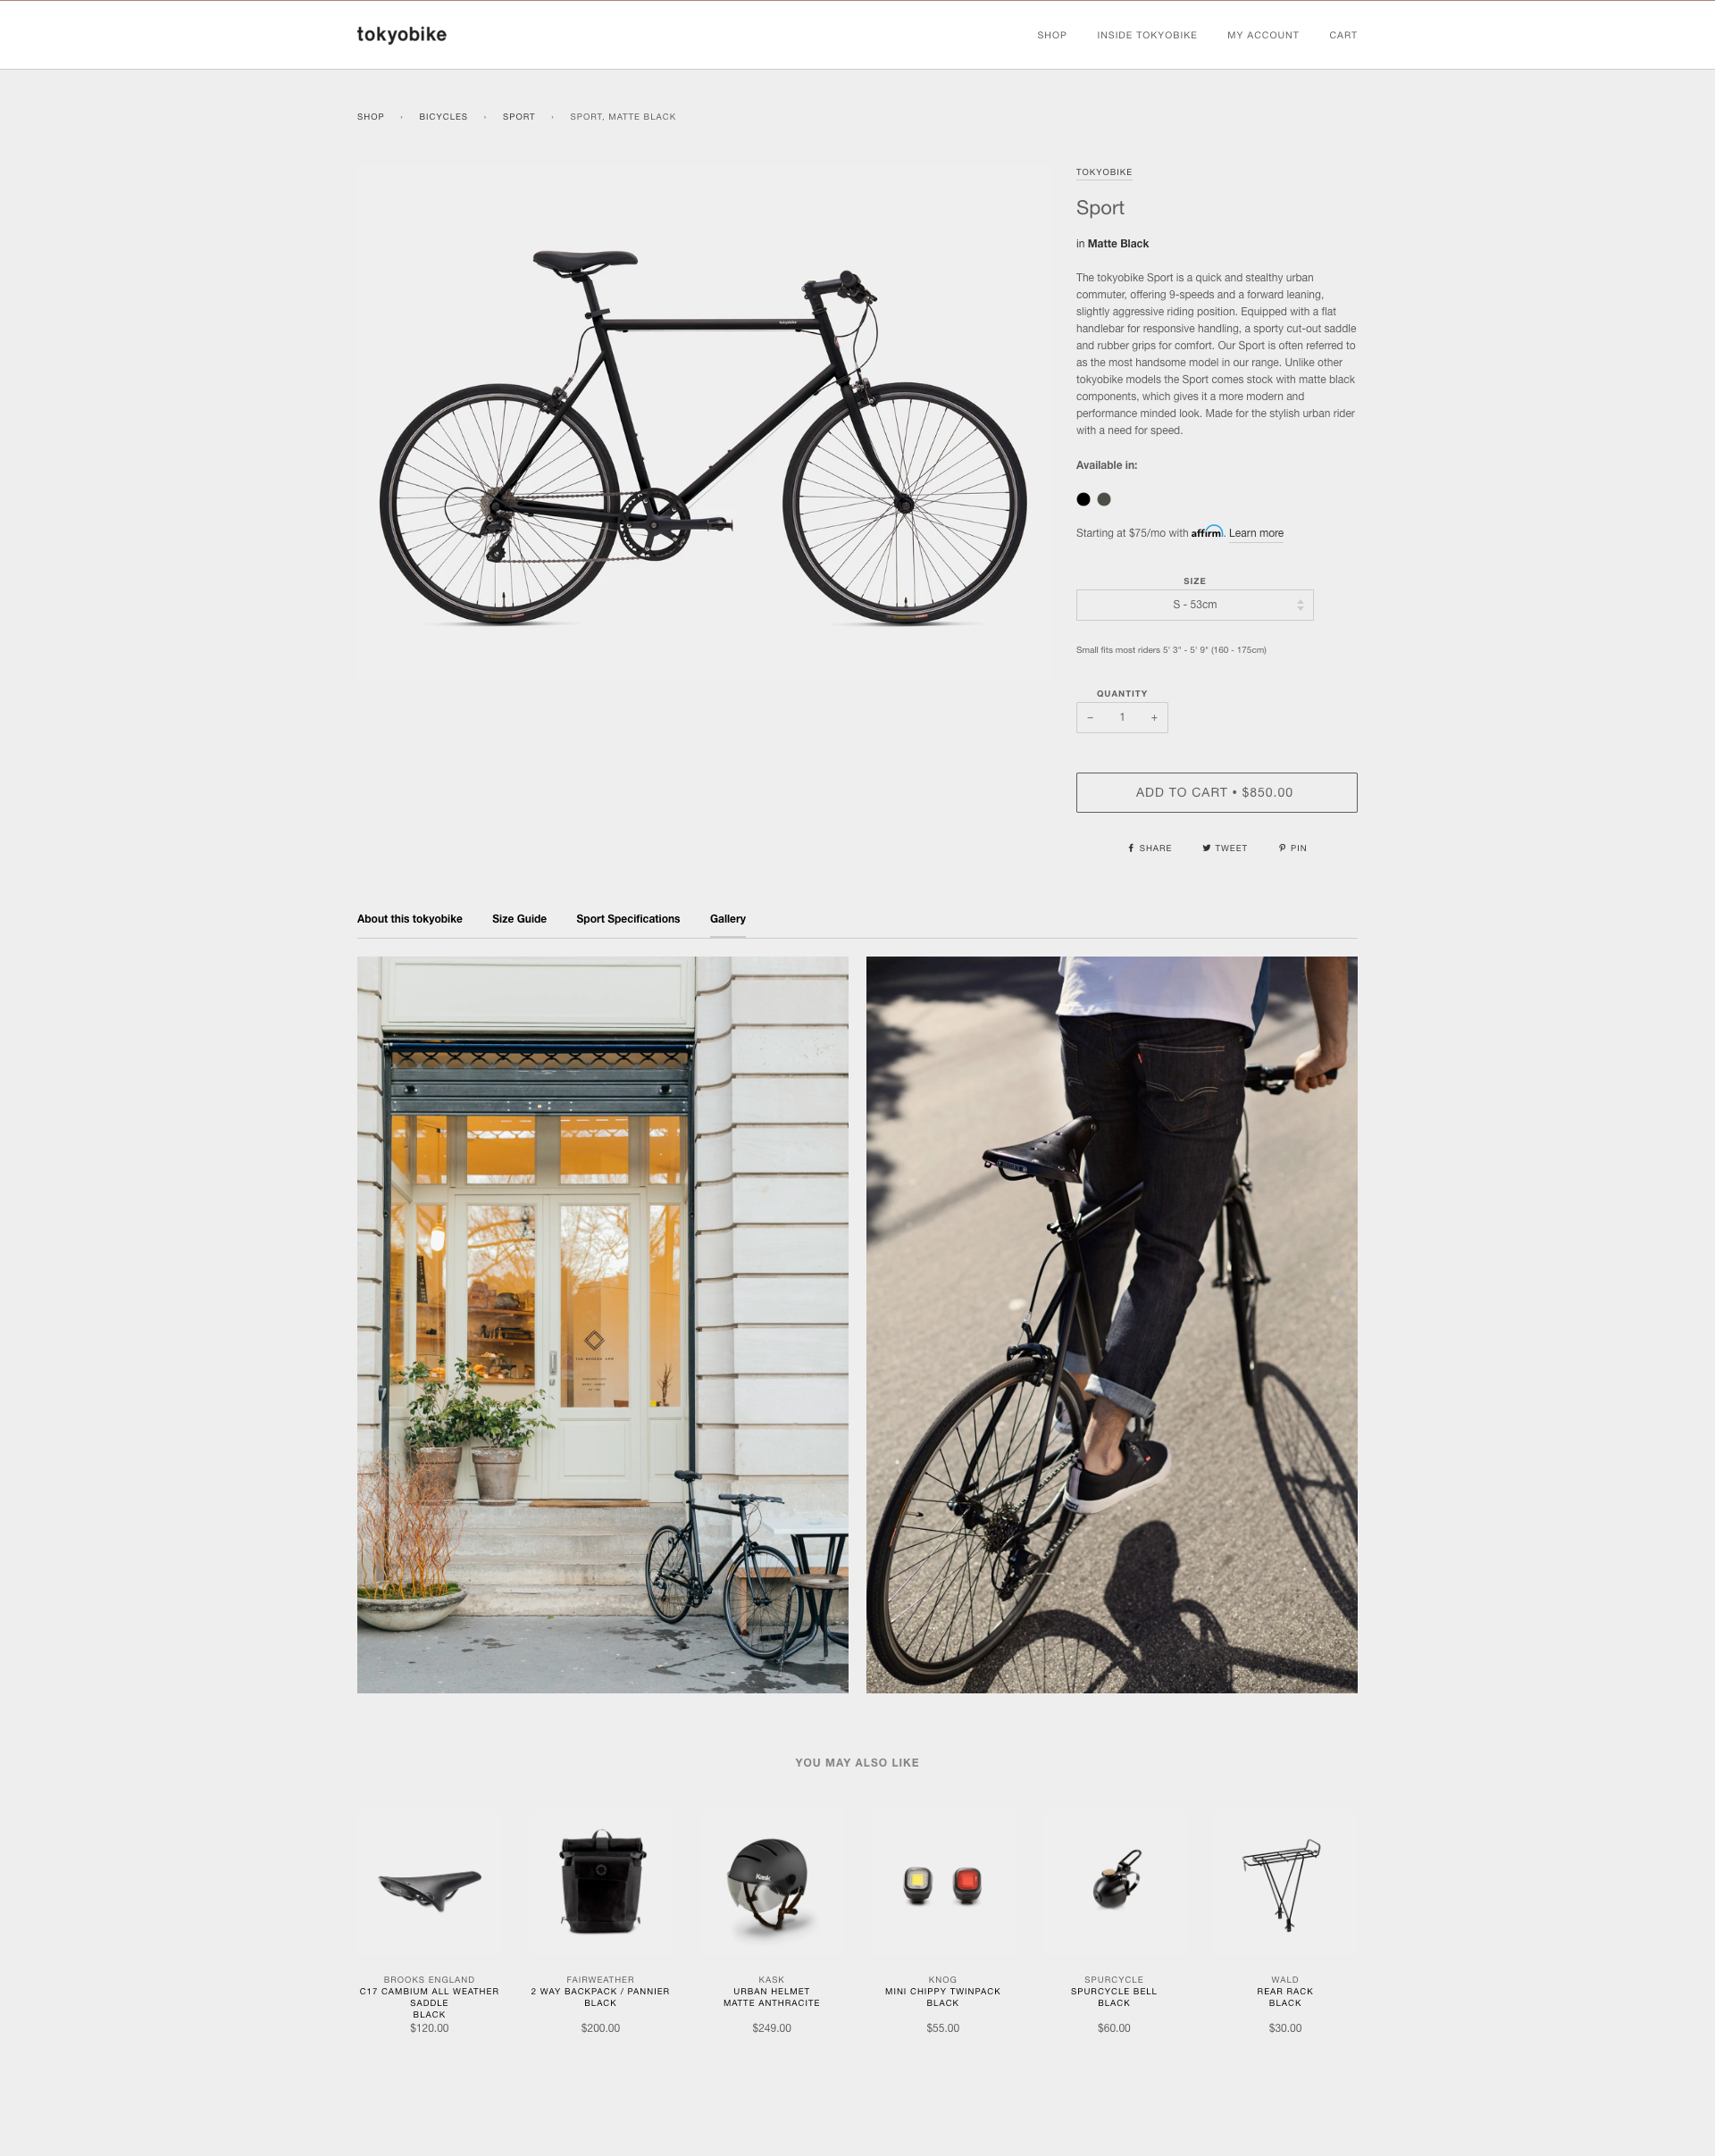 fiche produit Shopify : exemple Tokyobike